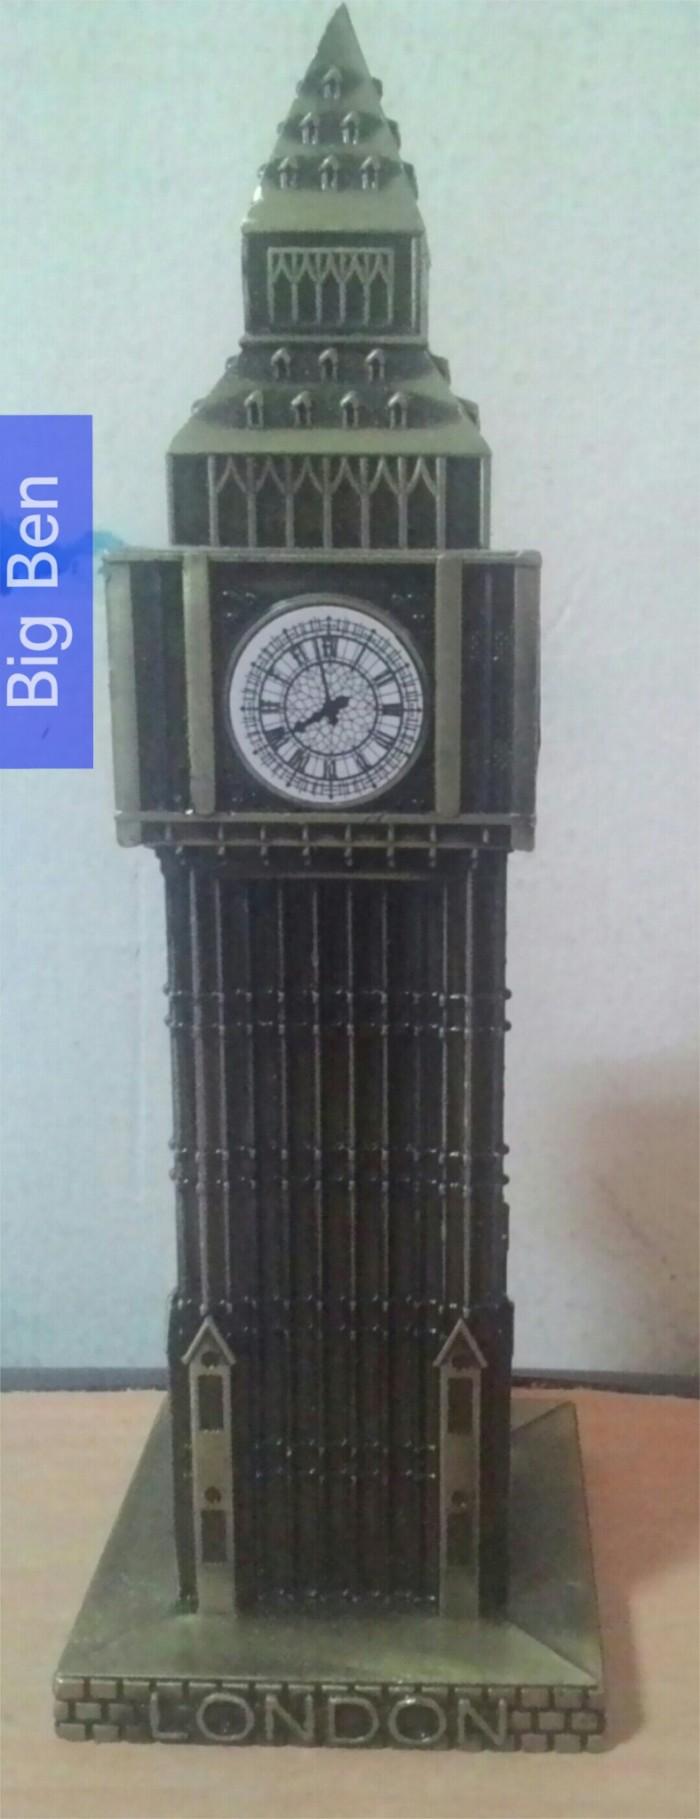 harga Miniatur menara london big ben - dark gold Tokopedia.com